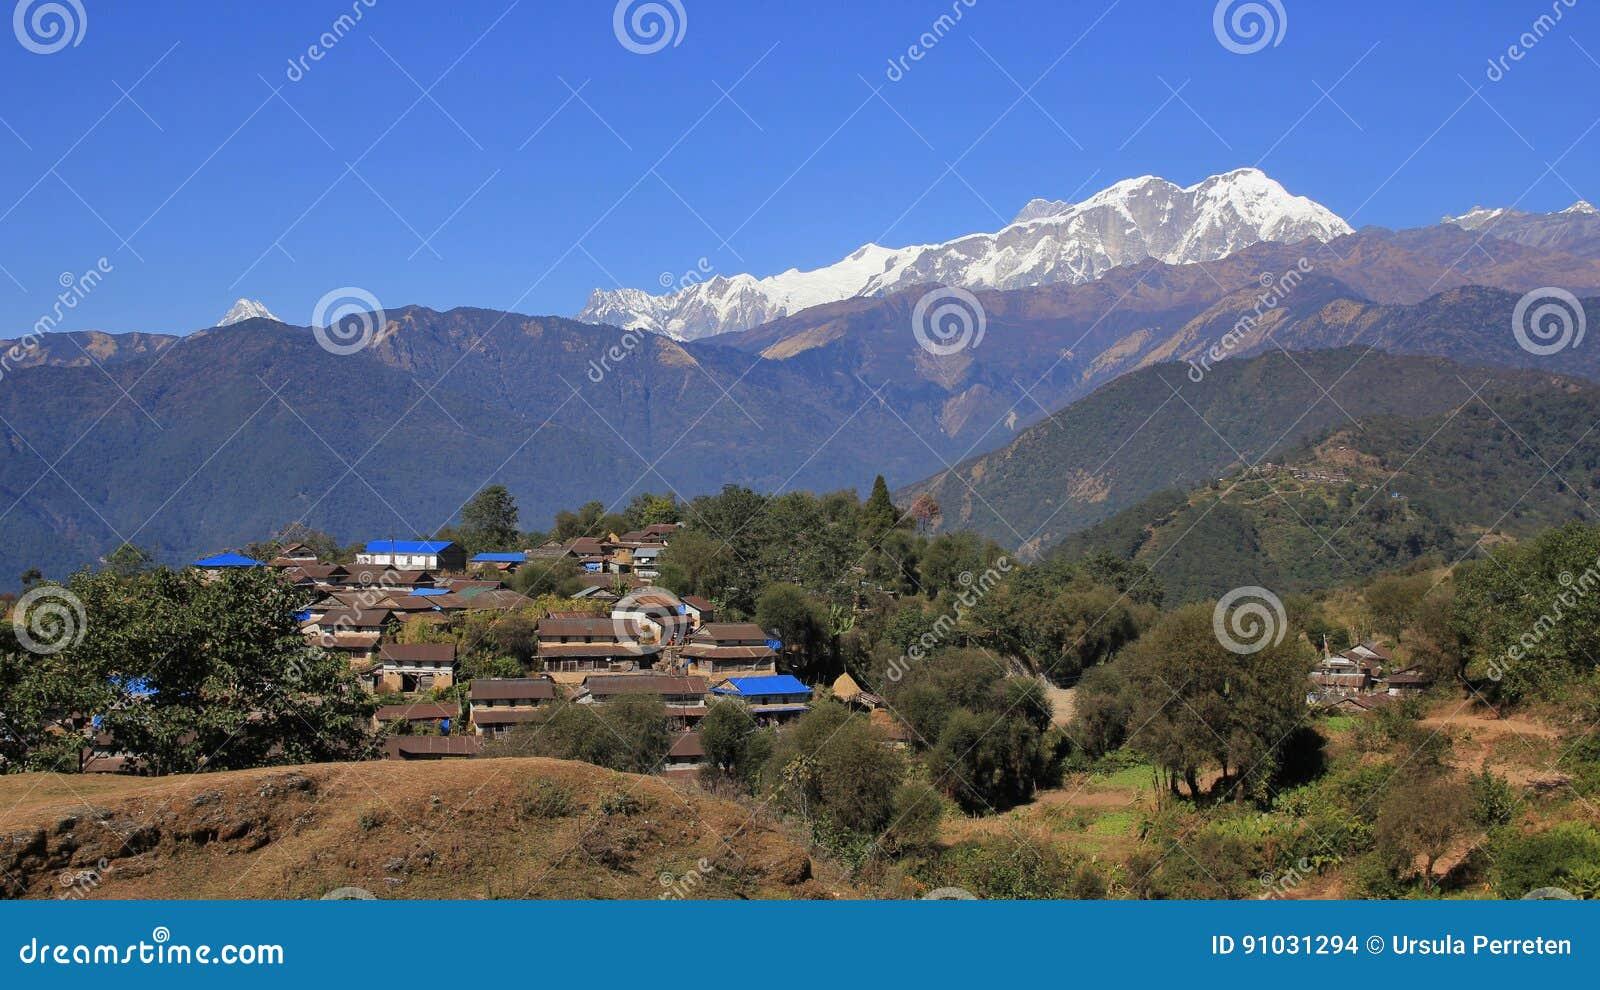 Villaggio Ghale Gaun di Gurung e gamma di Annapurna